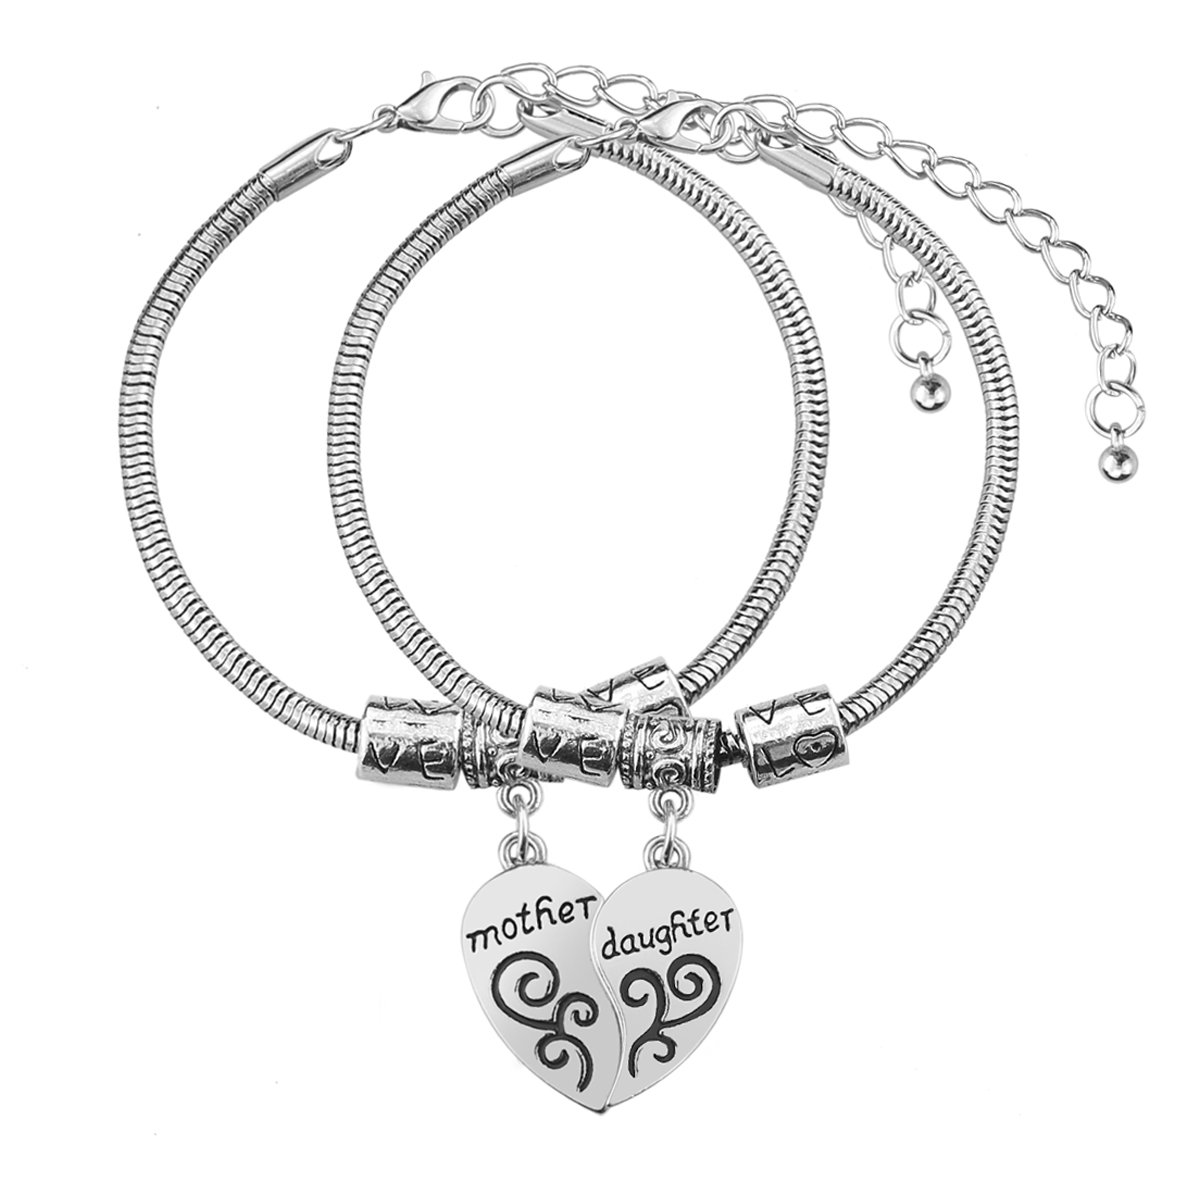 Best bracelets for mom | Amazon.com